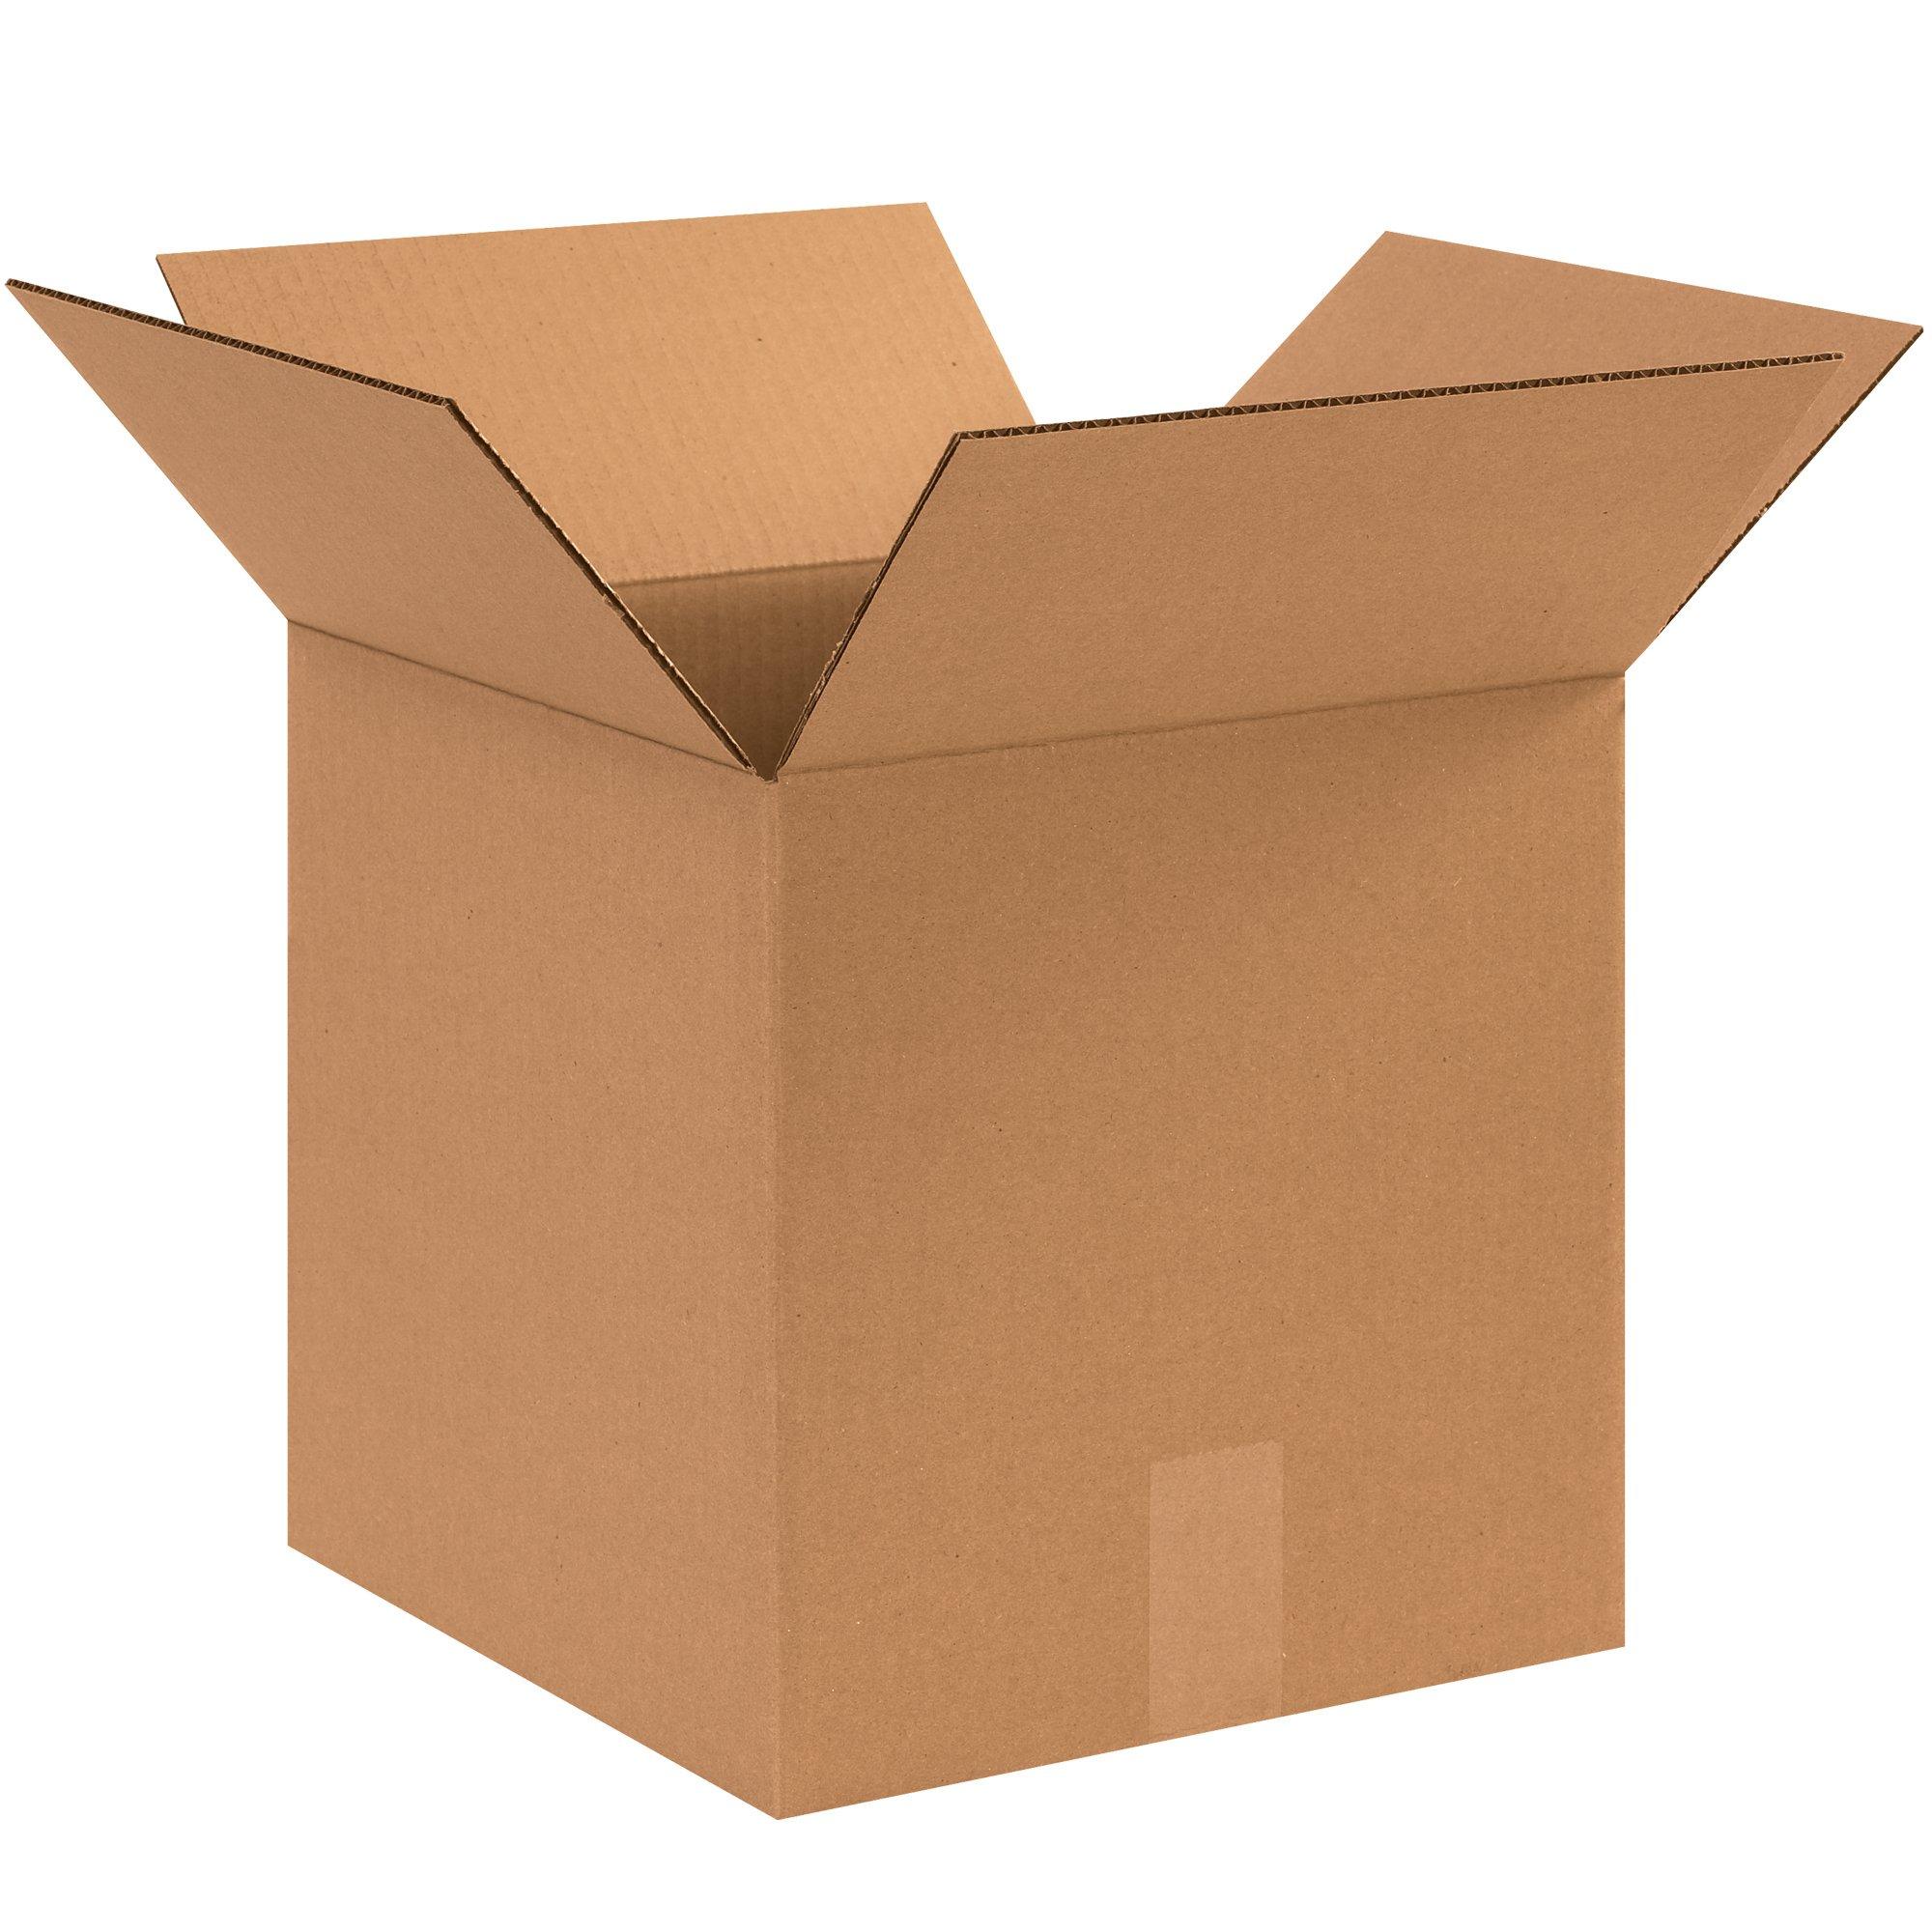 BOX USA B1212121000PK Corrugated Boxes, 12''L x 12''W x 12''H, Kraft (Pack of 1000)